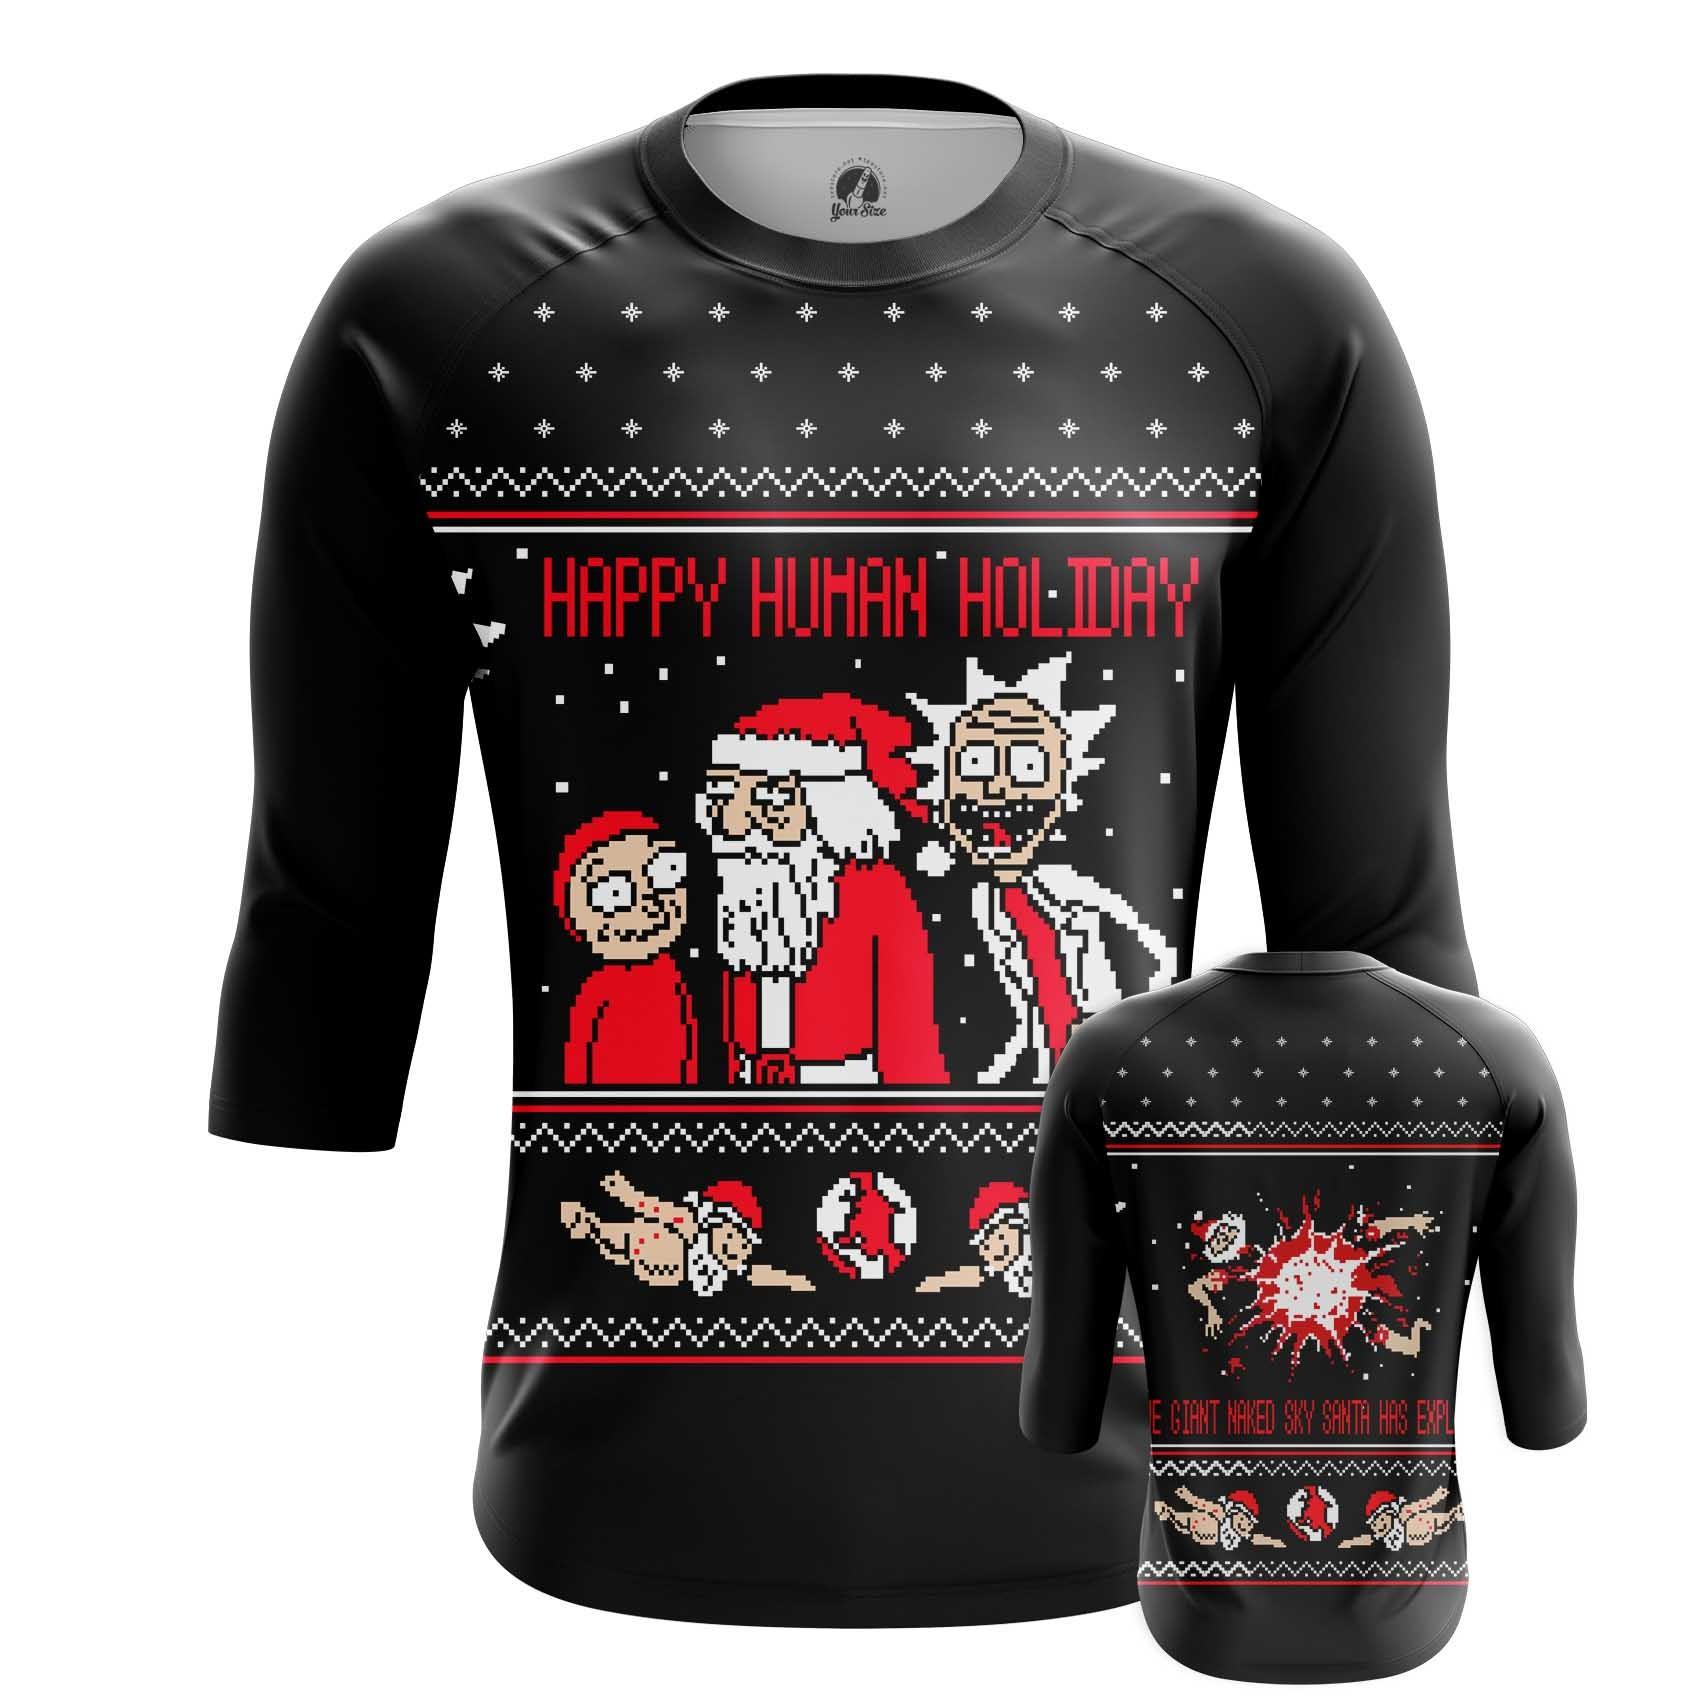 Футболка Happy Human Holiday купить